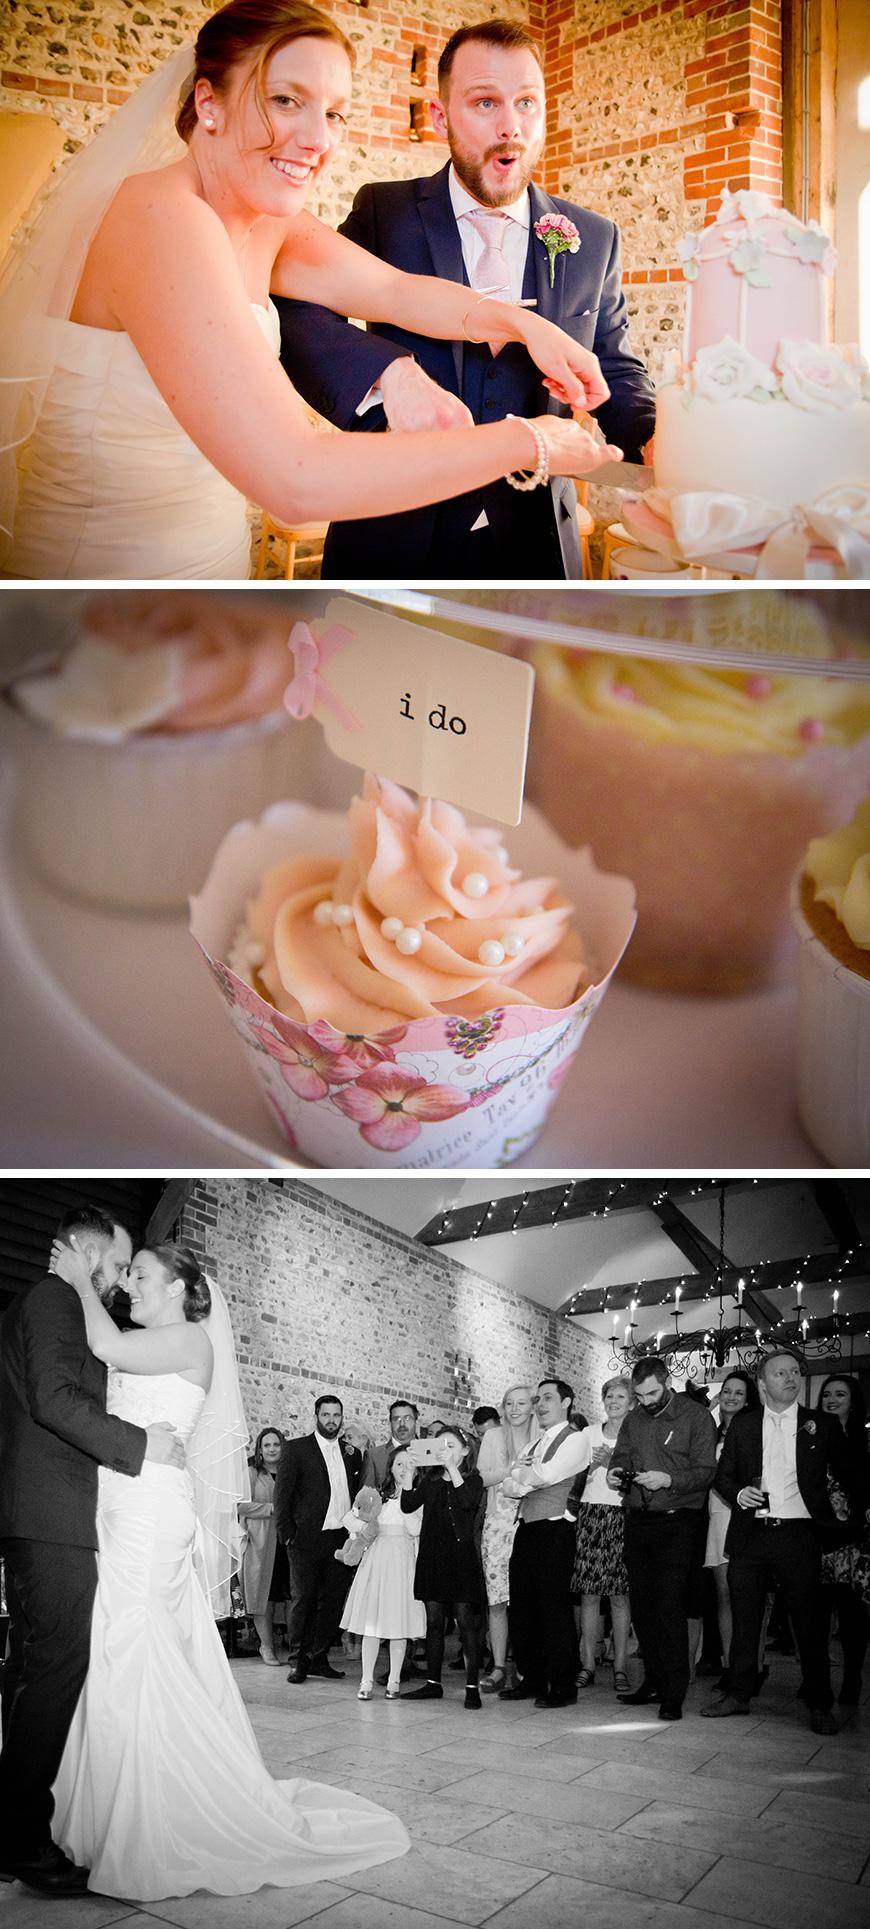 Real Wedding - Victoria and Jamie's Vintage Barn Wedding - Evening reception | CHWV